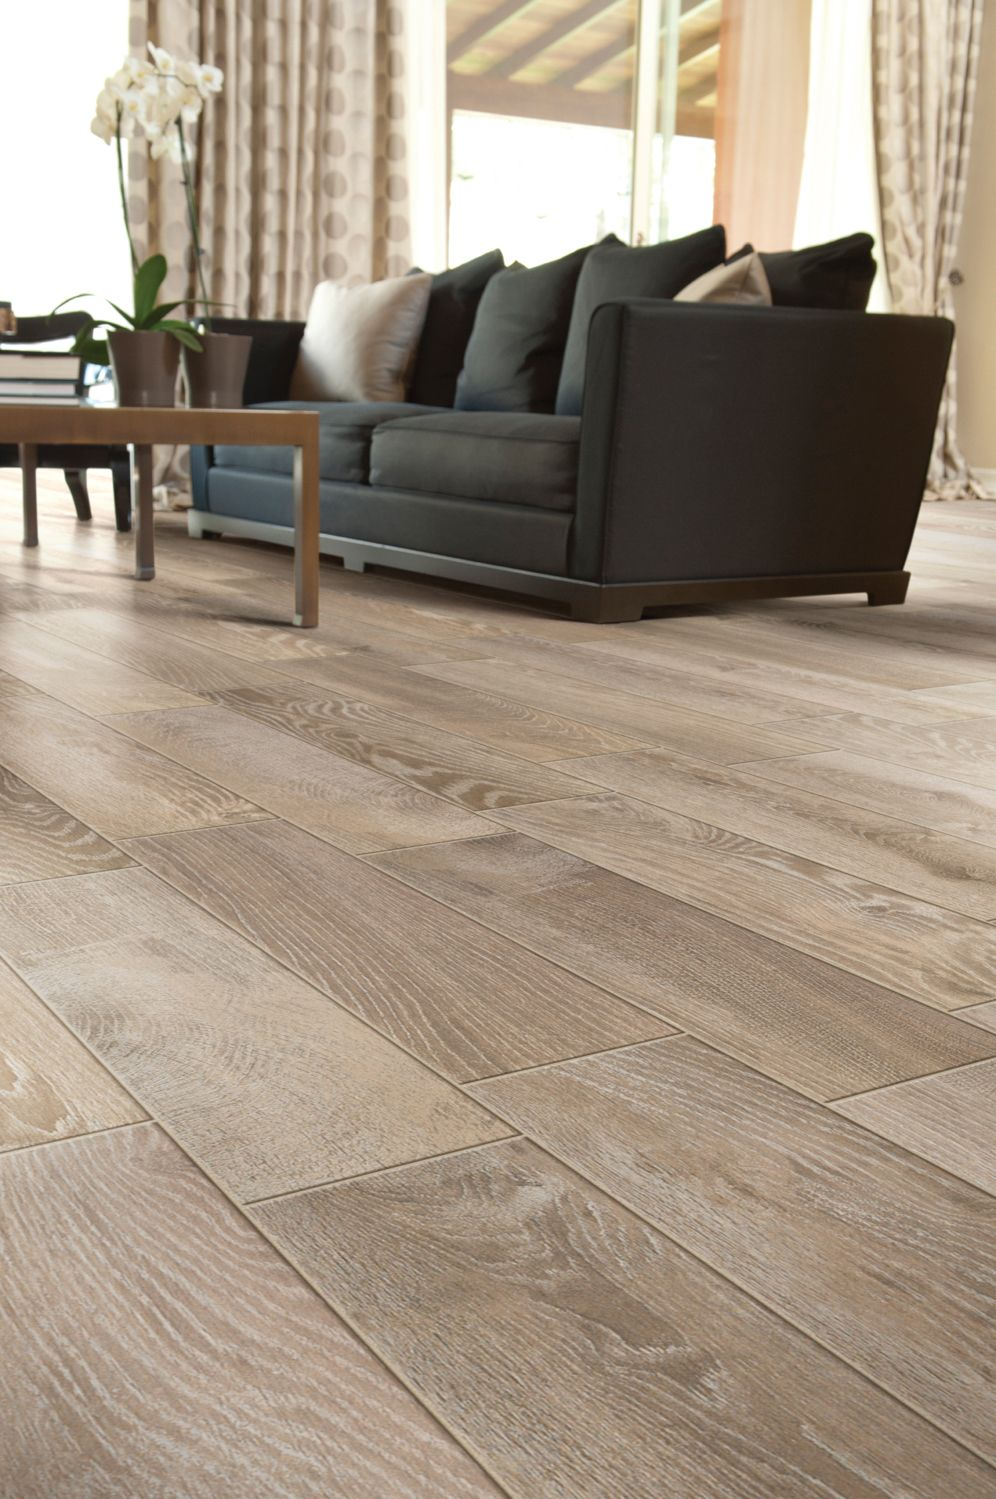 Cork Underlayment Premium Cork Sheets Rolls Gray Wood Tile